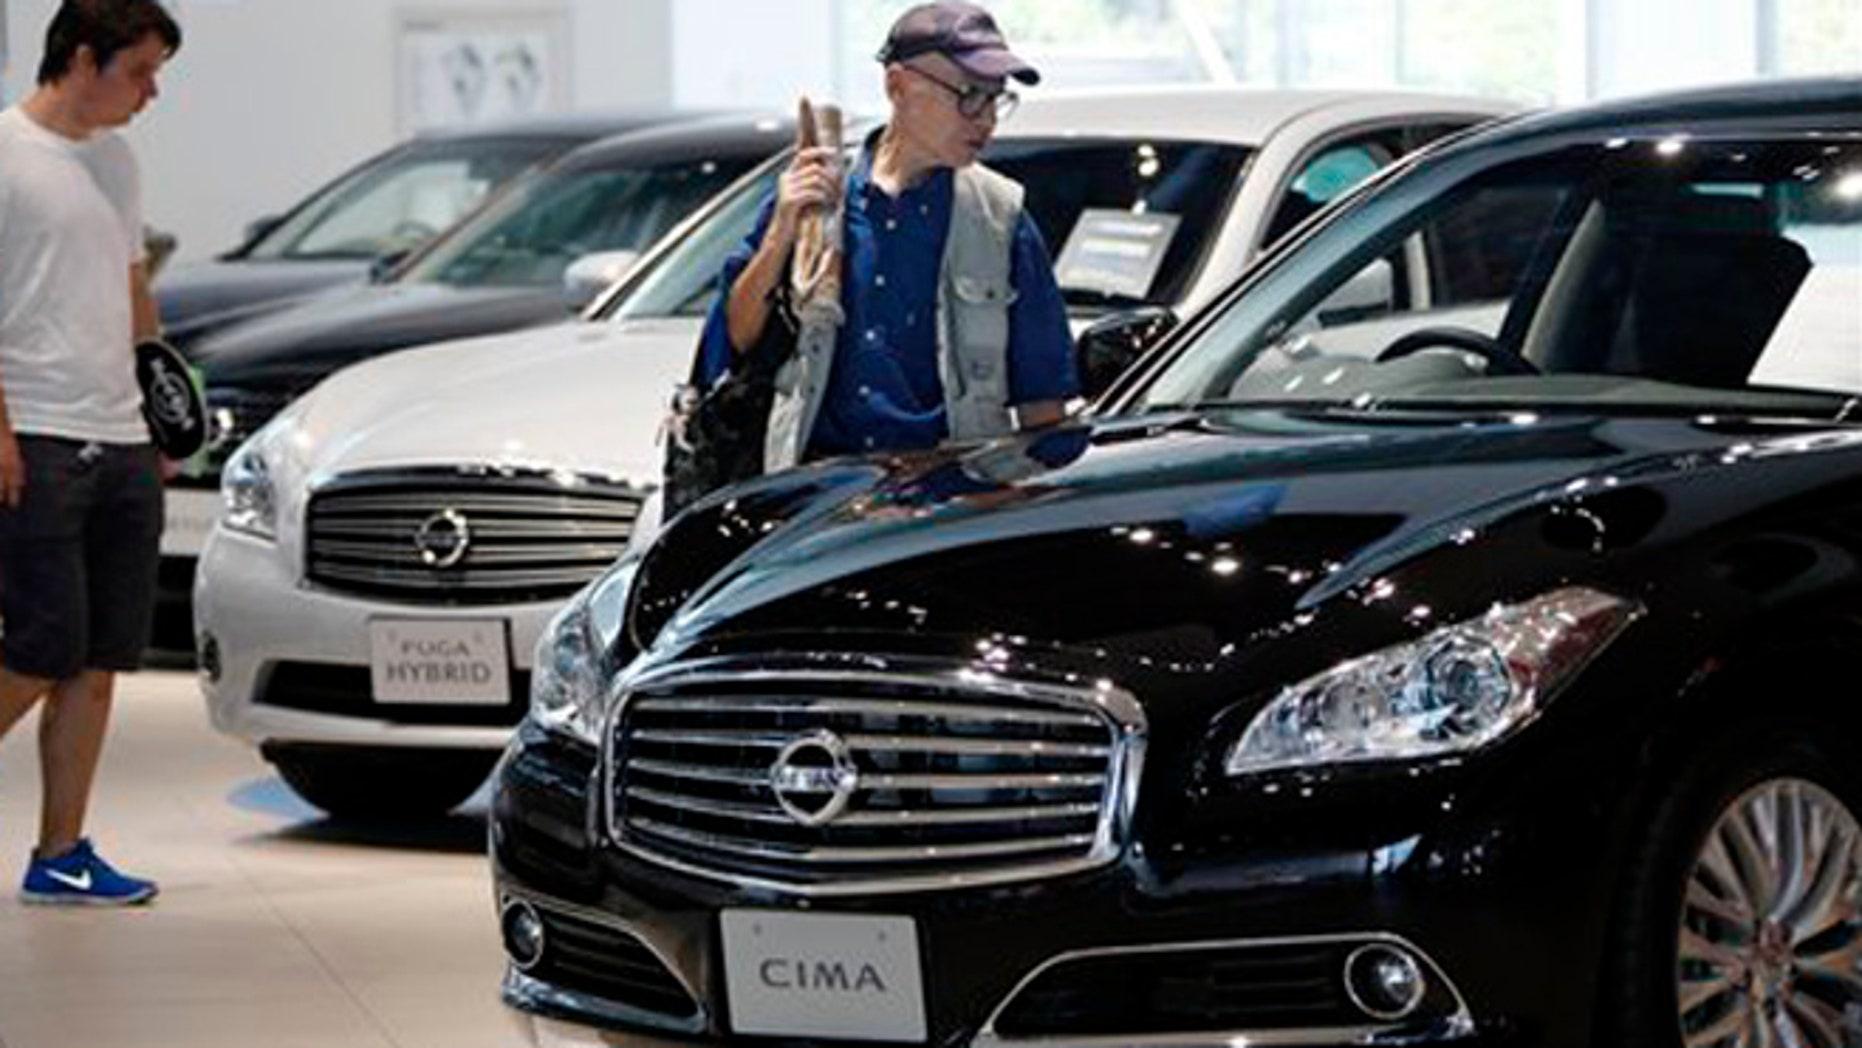 FILE: July 26, 2012: Visitors inspect cars at the Nissan Motor Co. global headquarters in Yokohama, Japan.